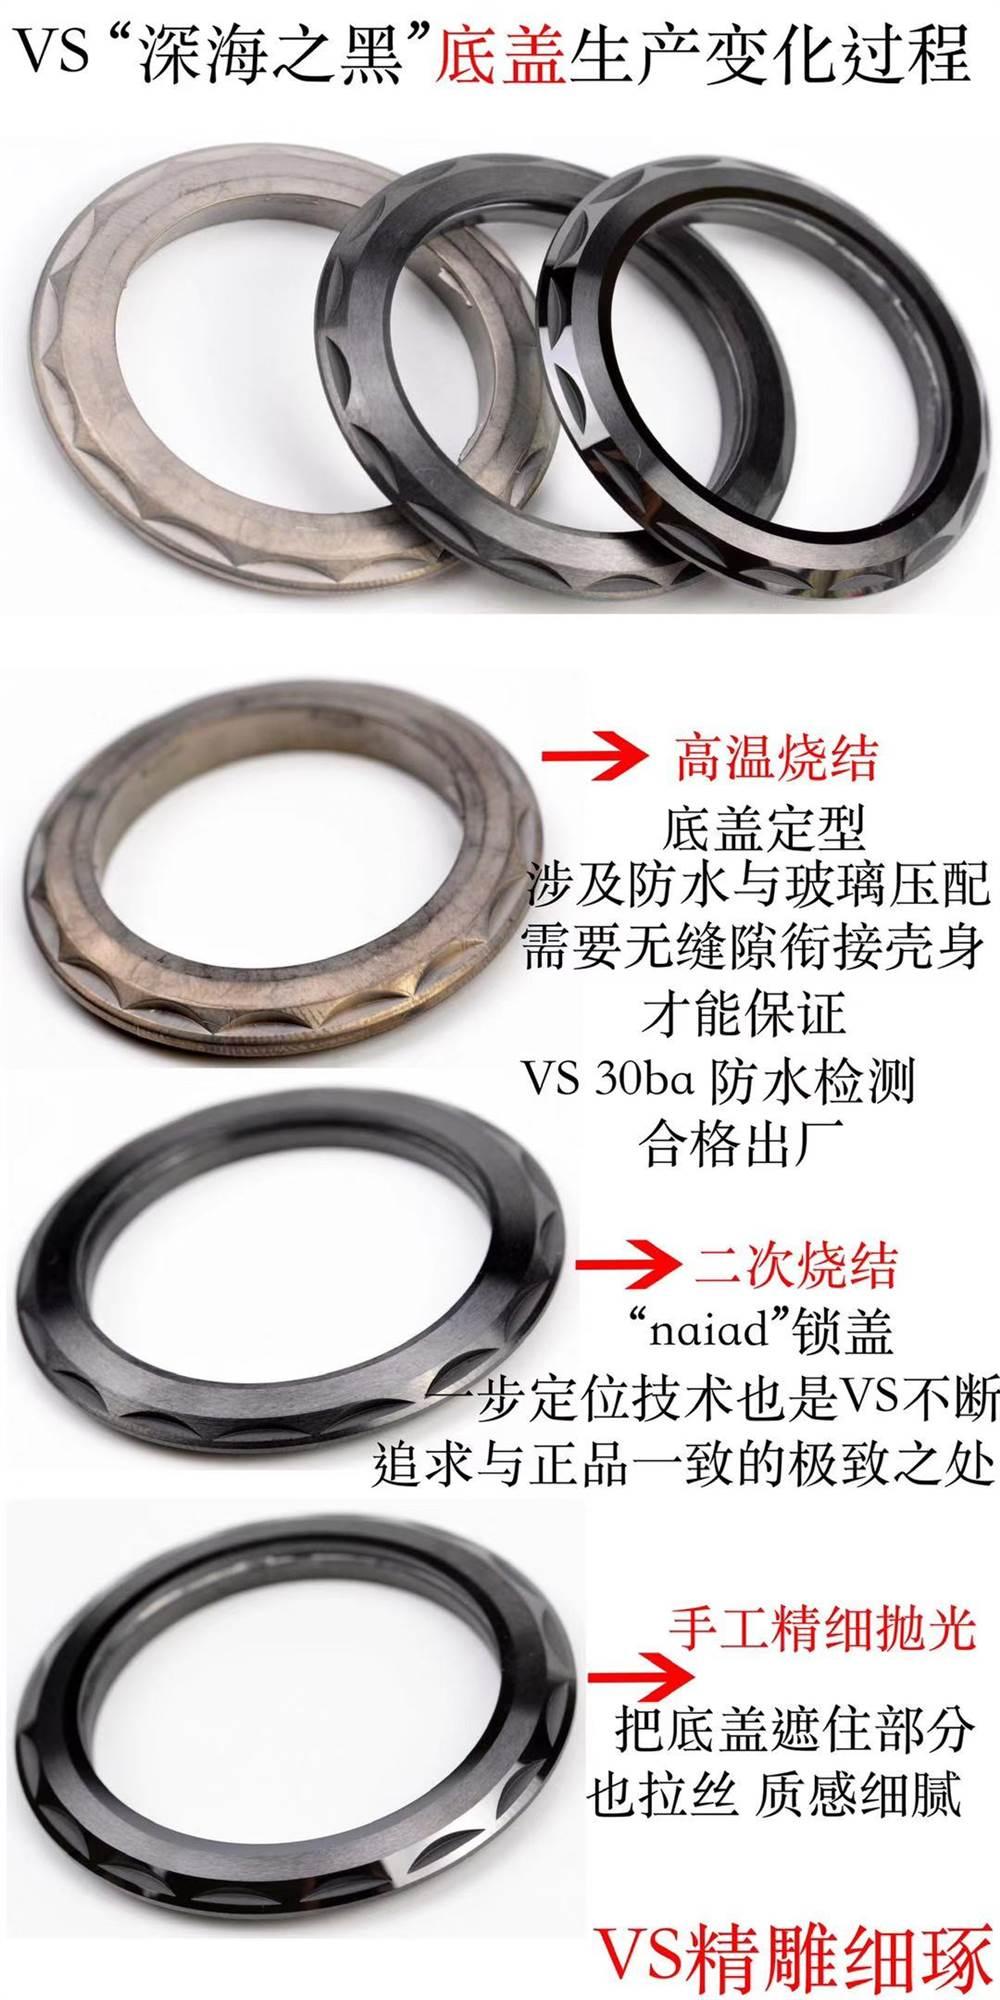 VS厂欧米茄深海之黑腕表所有配件生产变化过程详解-真正良心之作